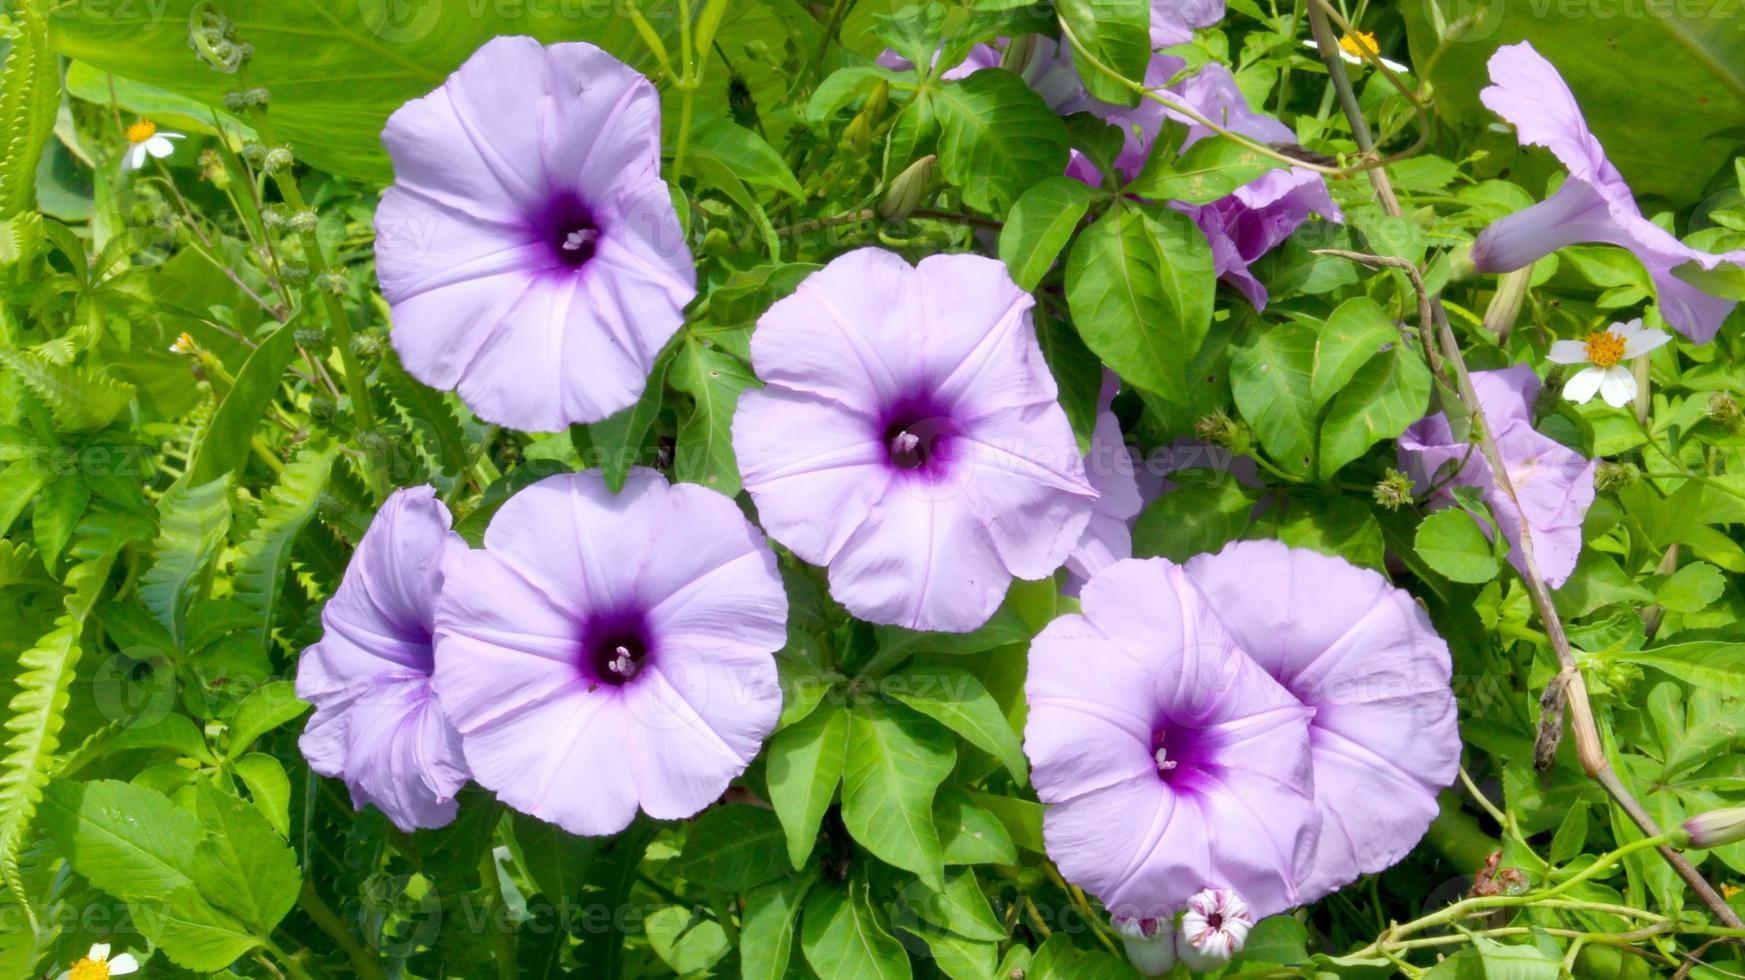 Convolvulus Blüten foto